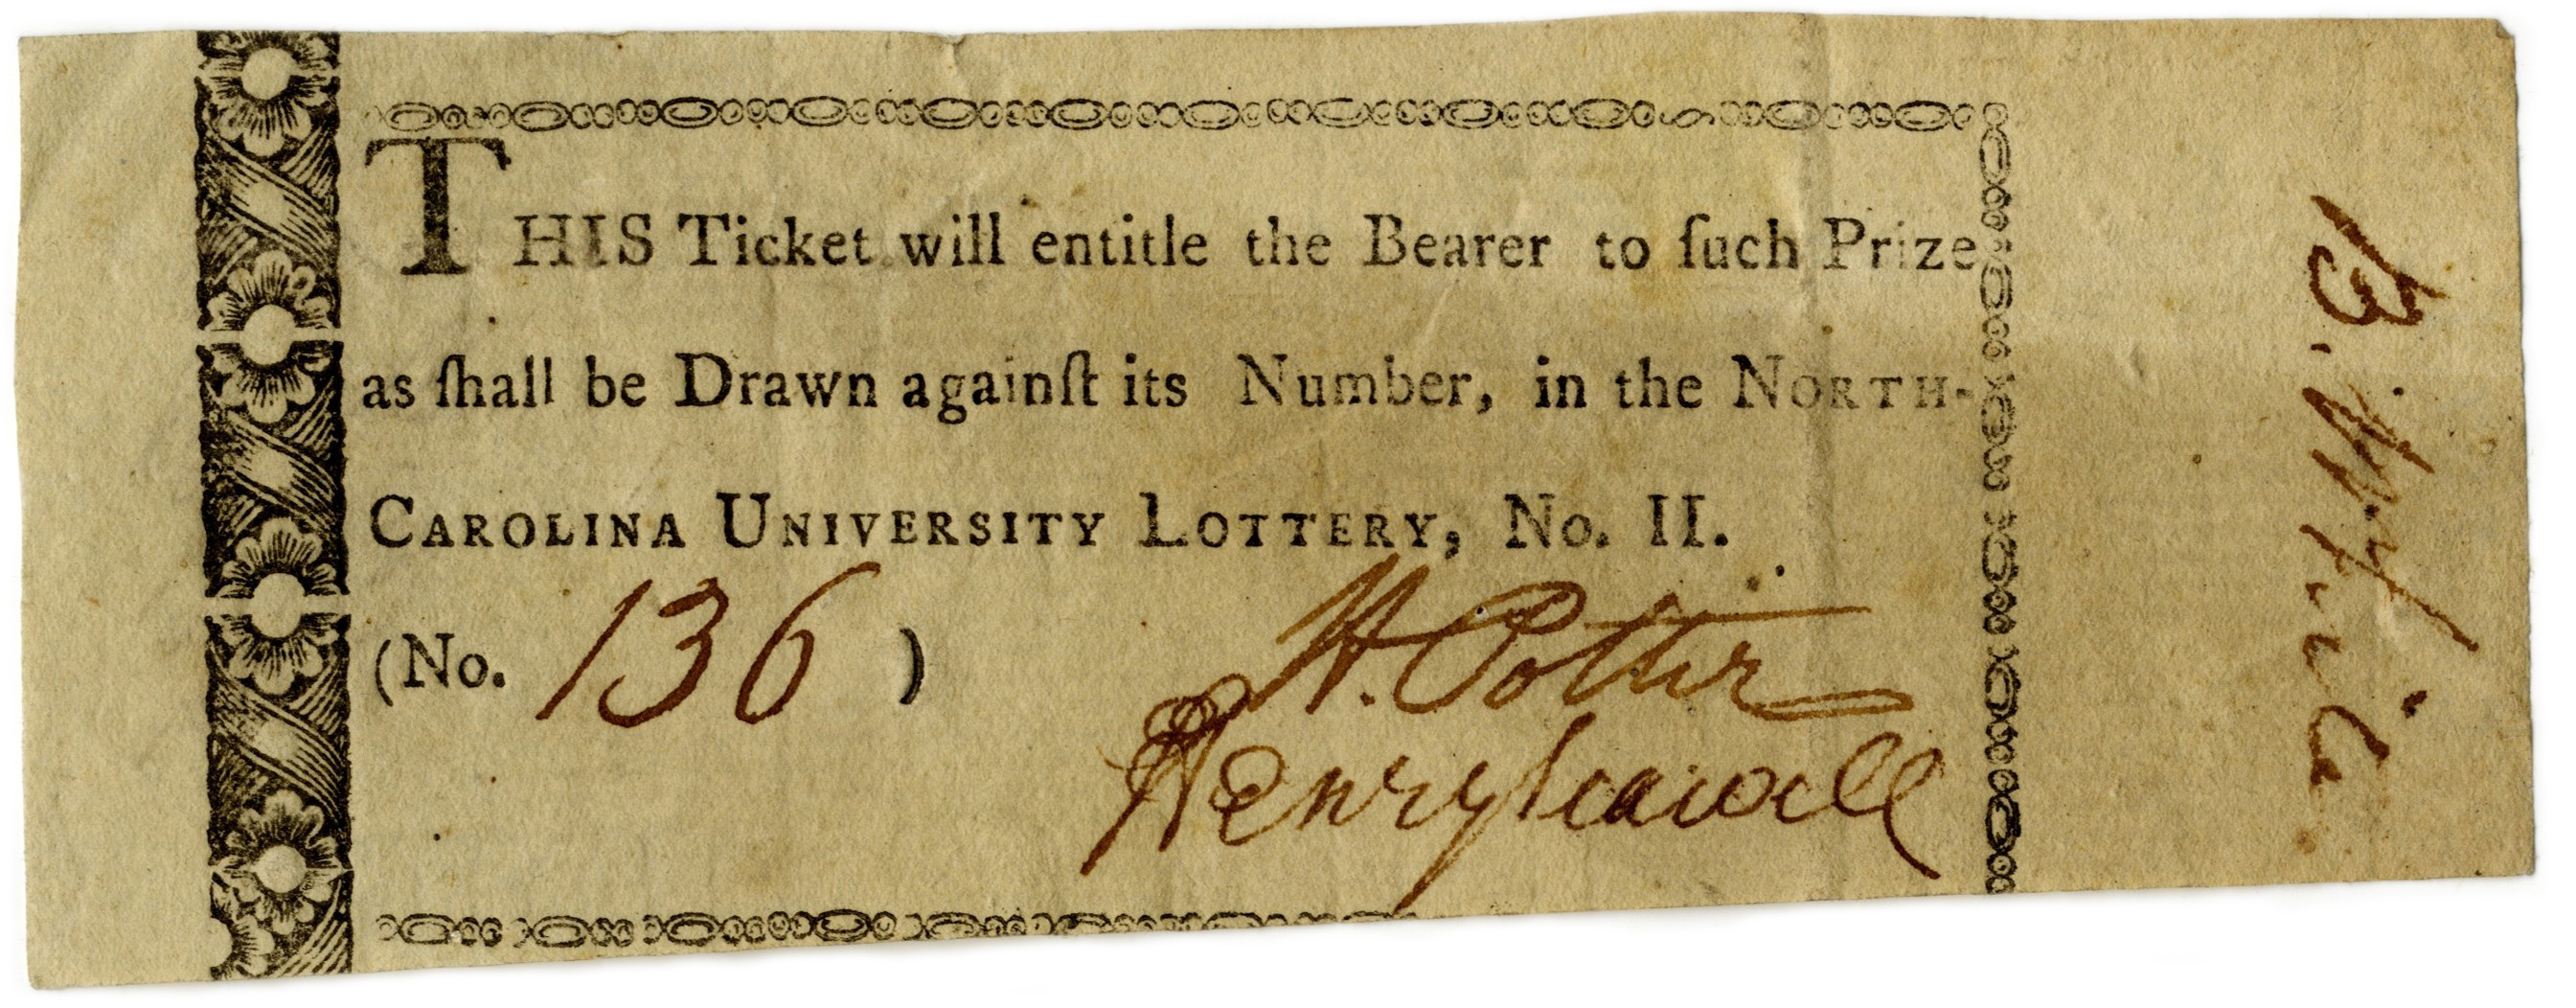 University of North Carolina lottery ticket, 1801